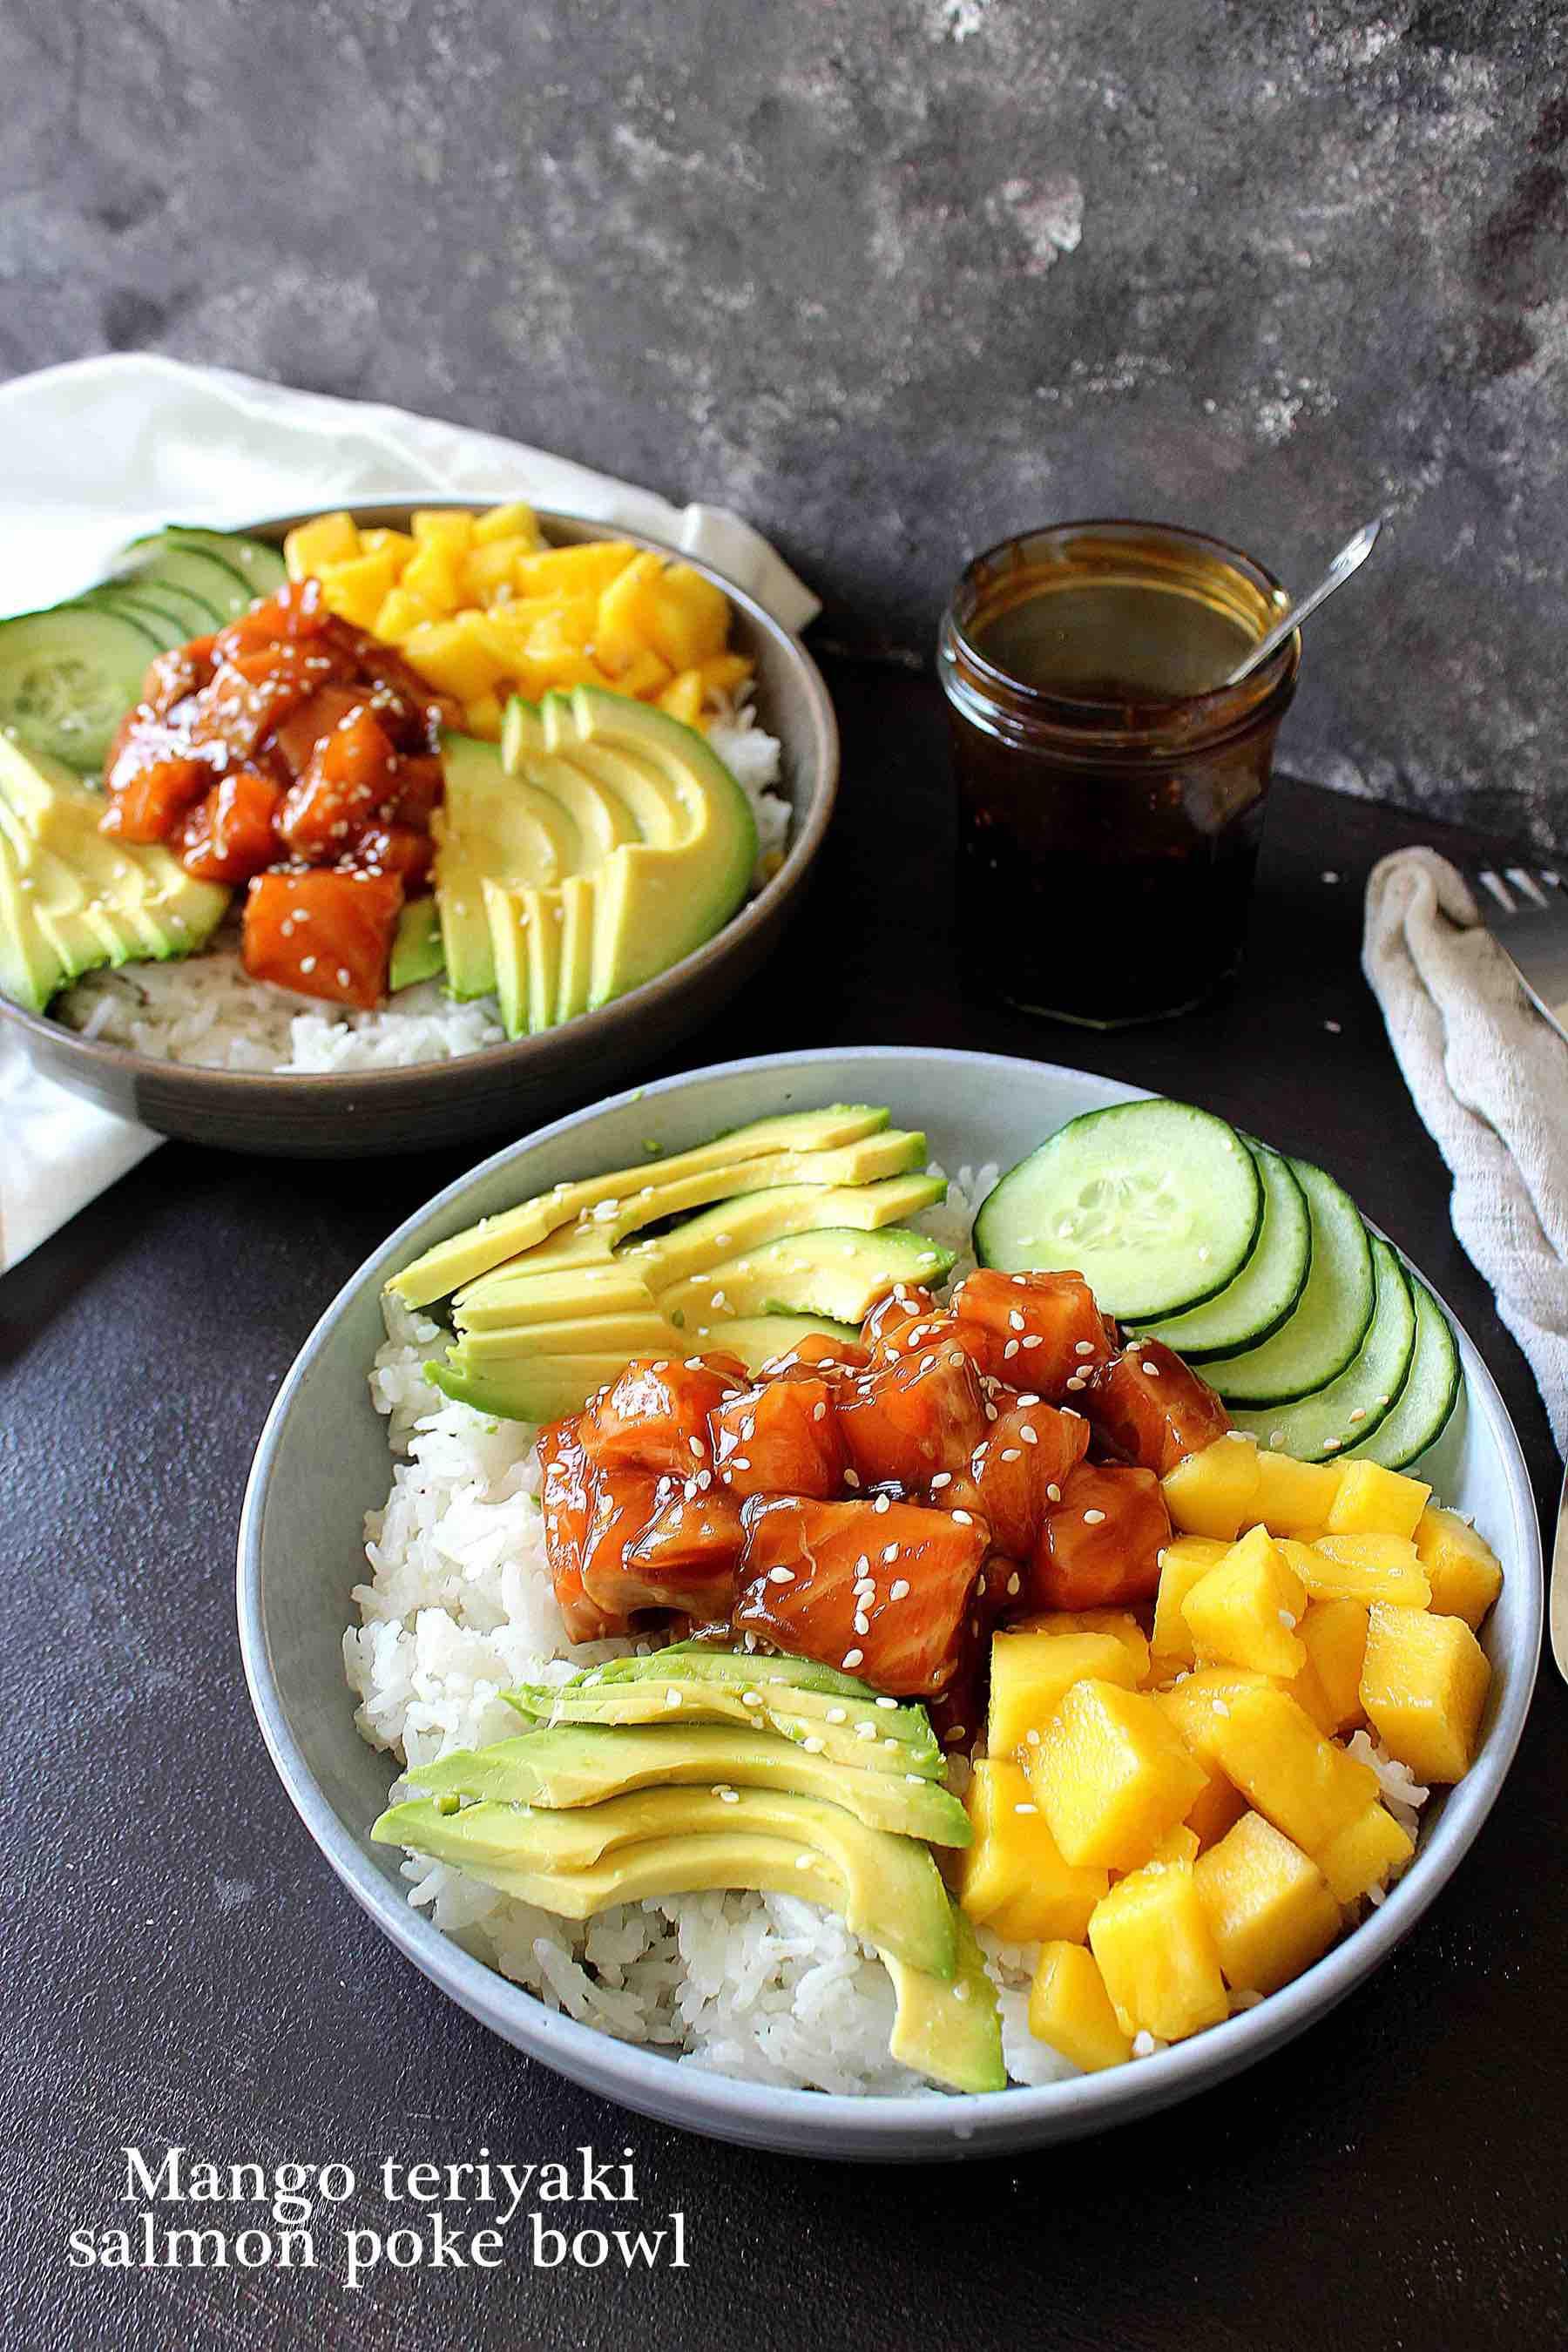 Mango teriyaki salmon poke bowl